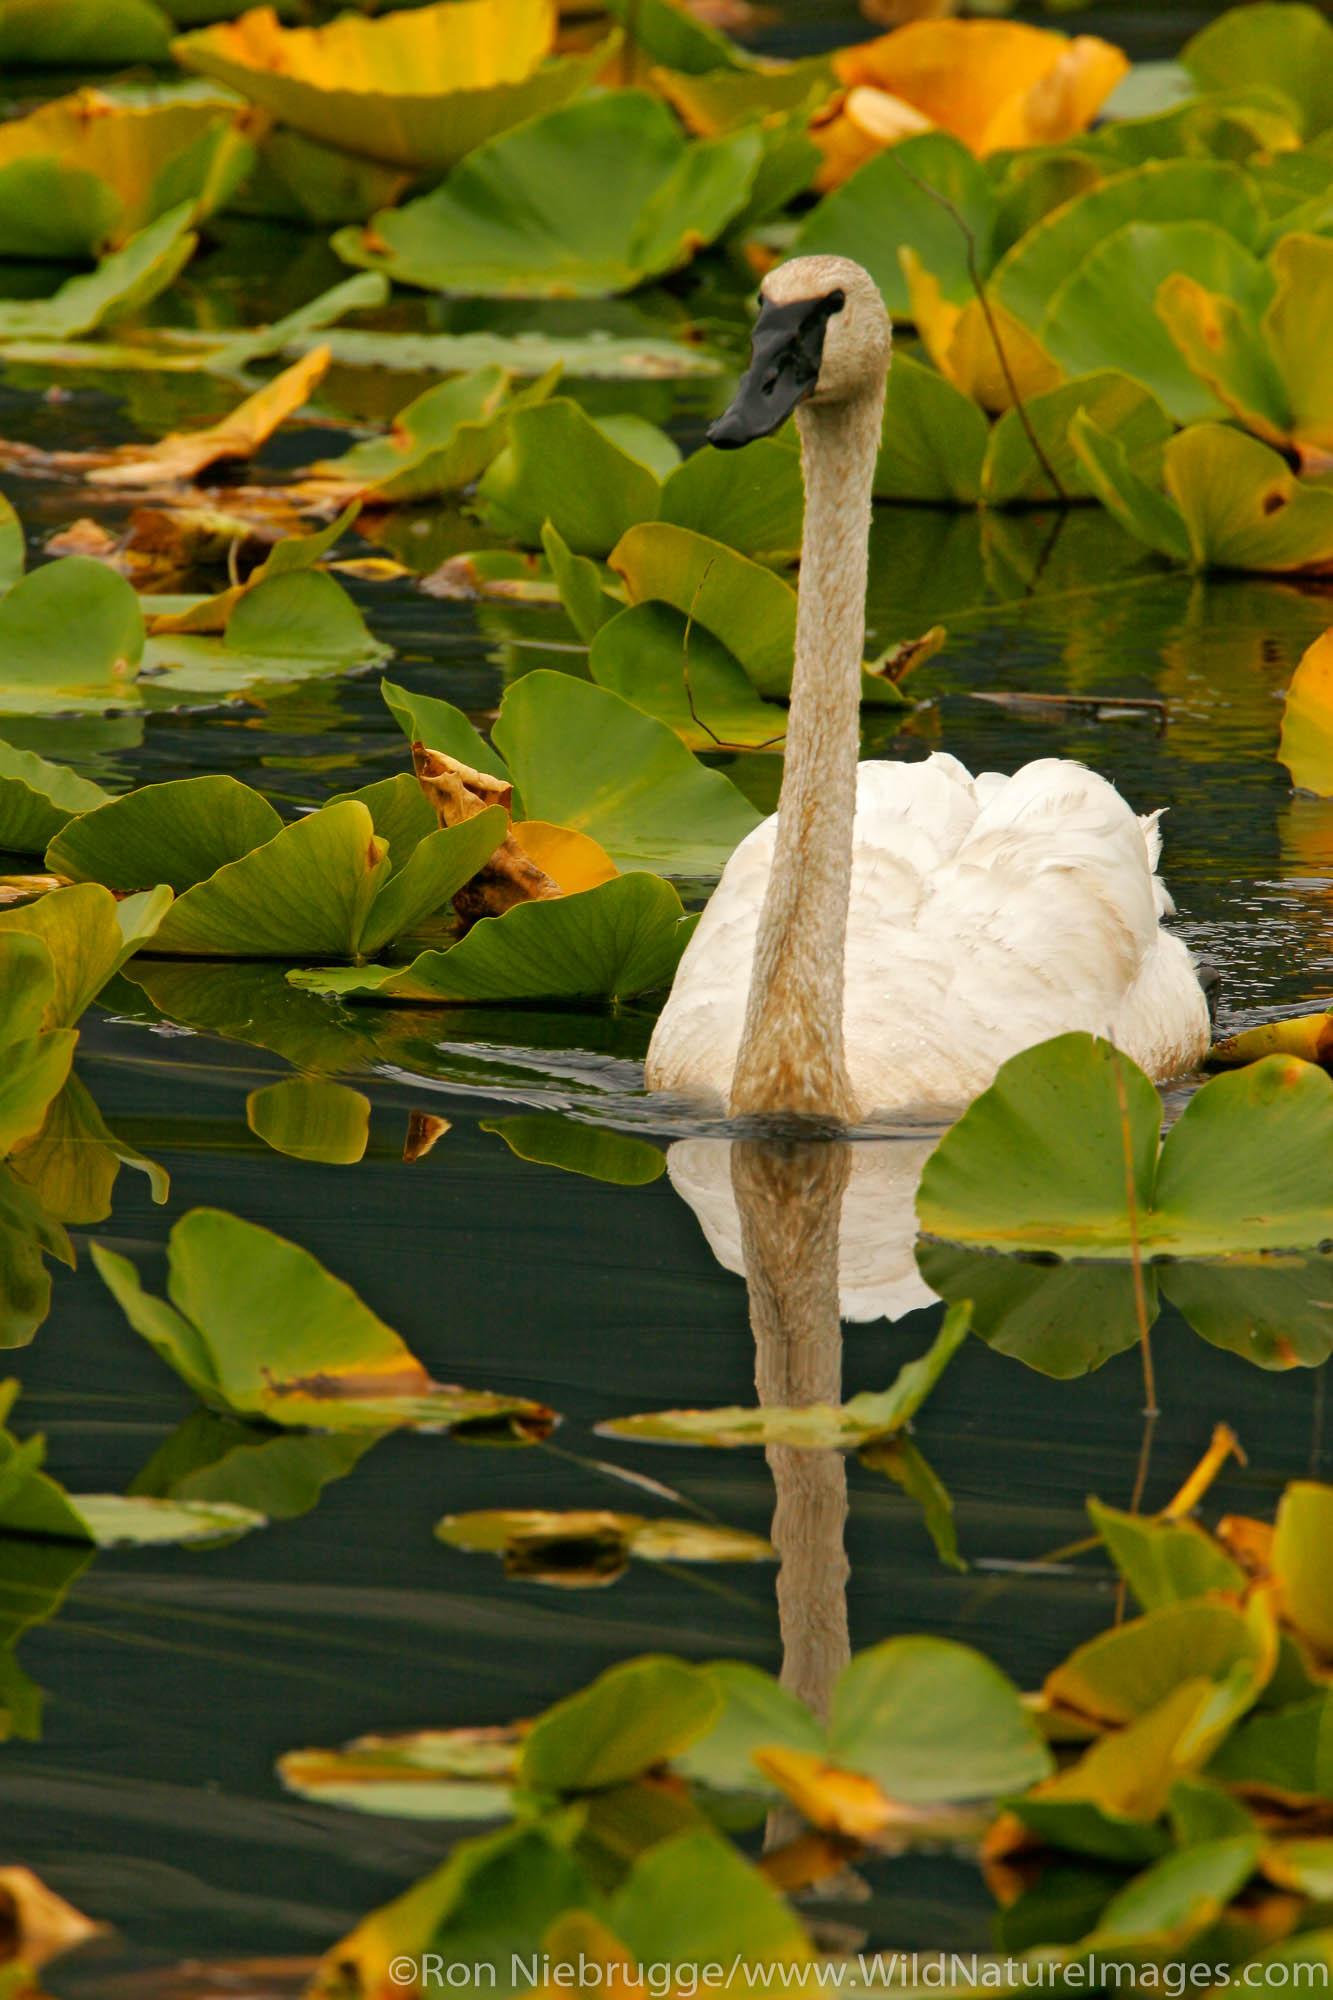 Swan in lily pads along the Seward Highway, Chugach National Forest, near Seward, Alaska.